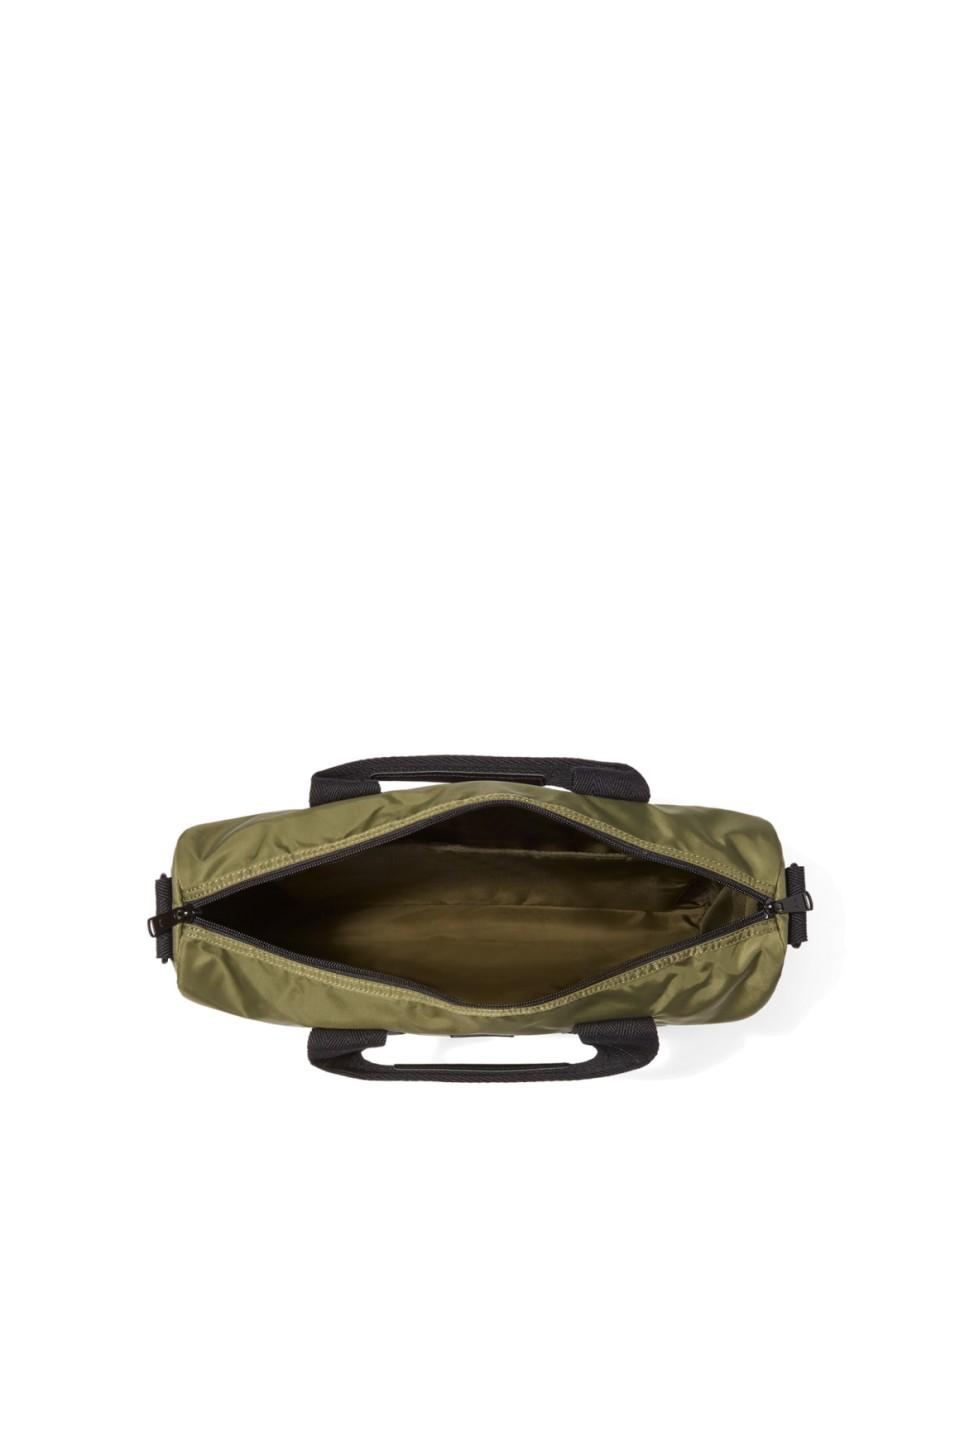 fredperry-nylon-work-bag-olive